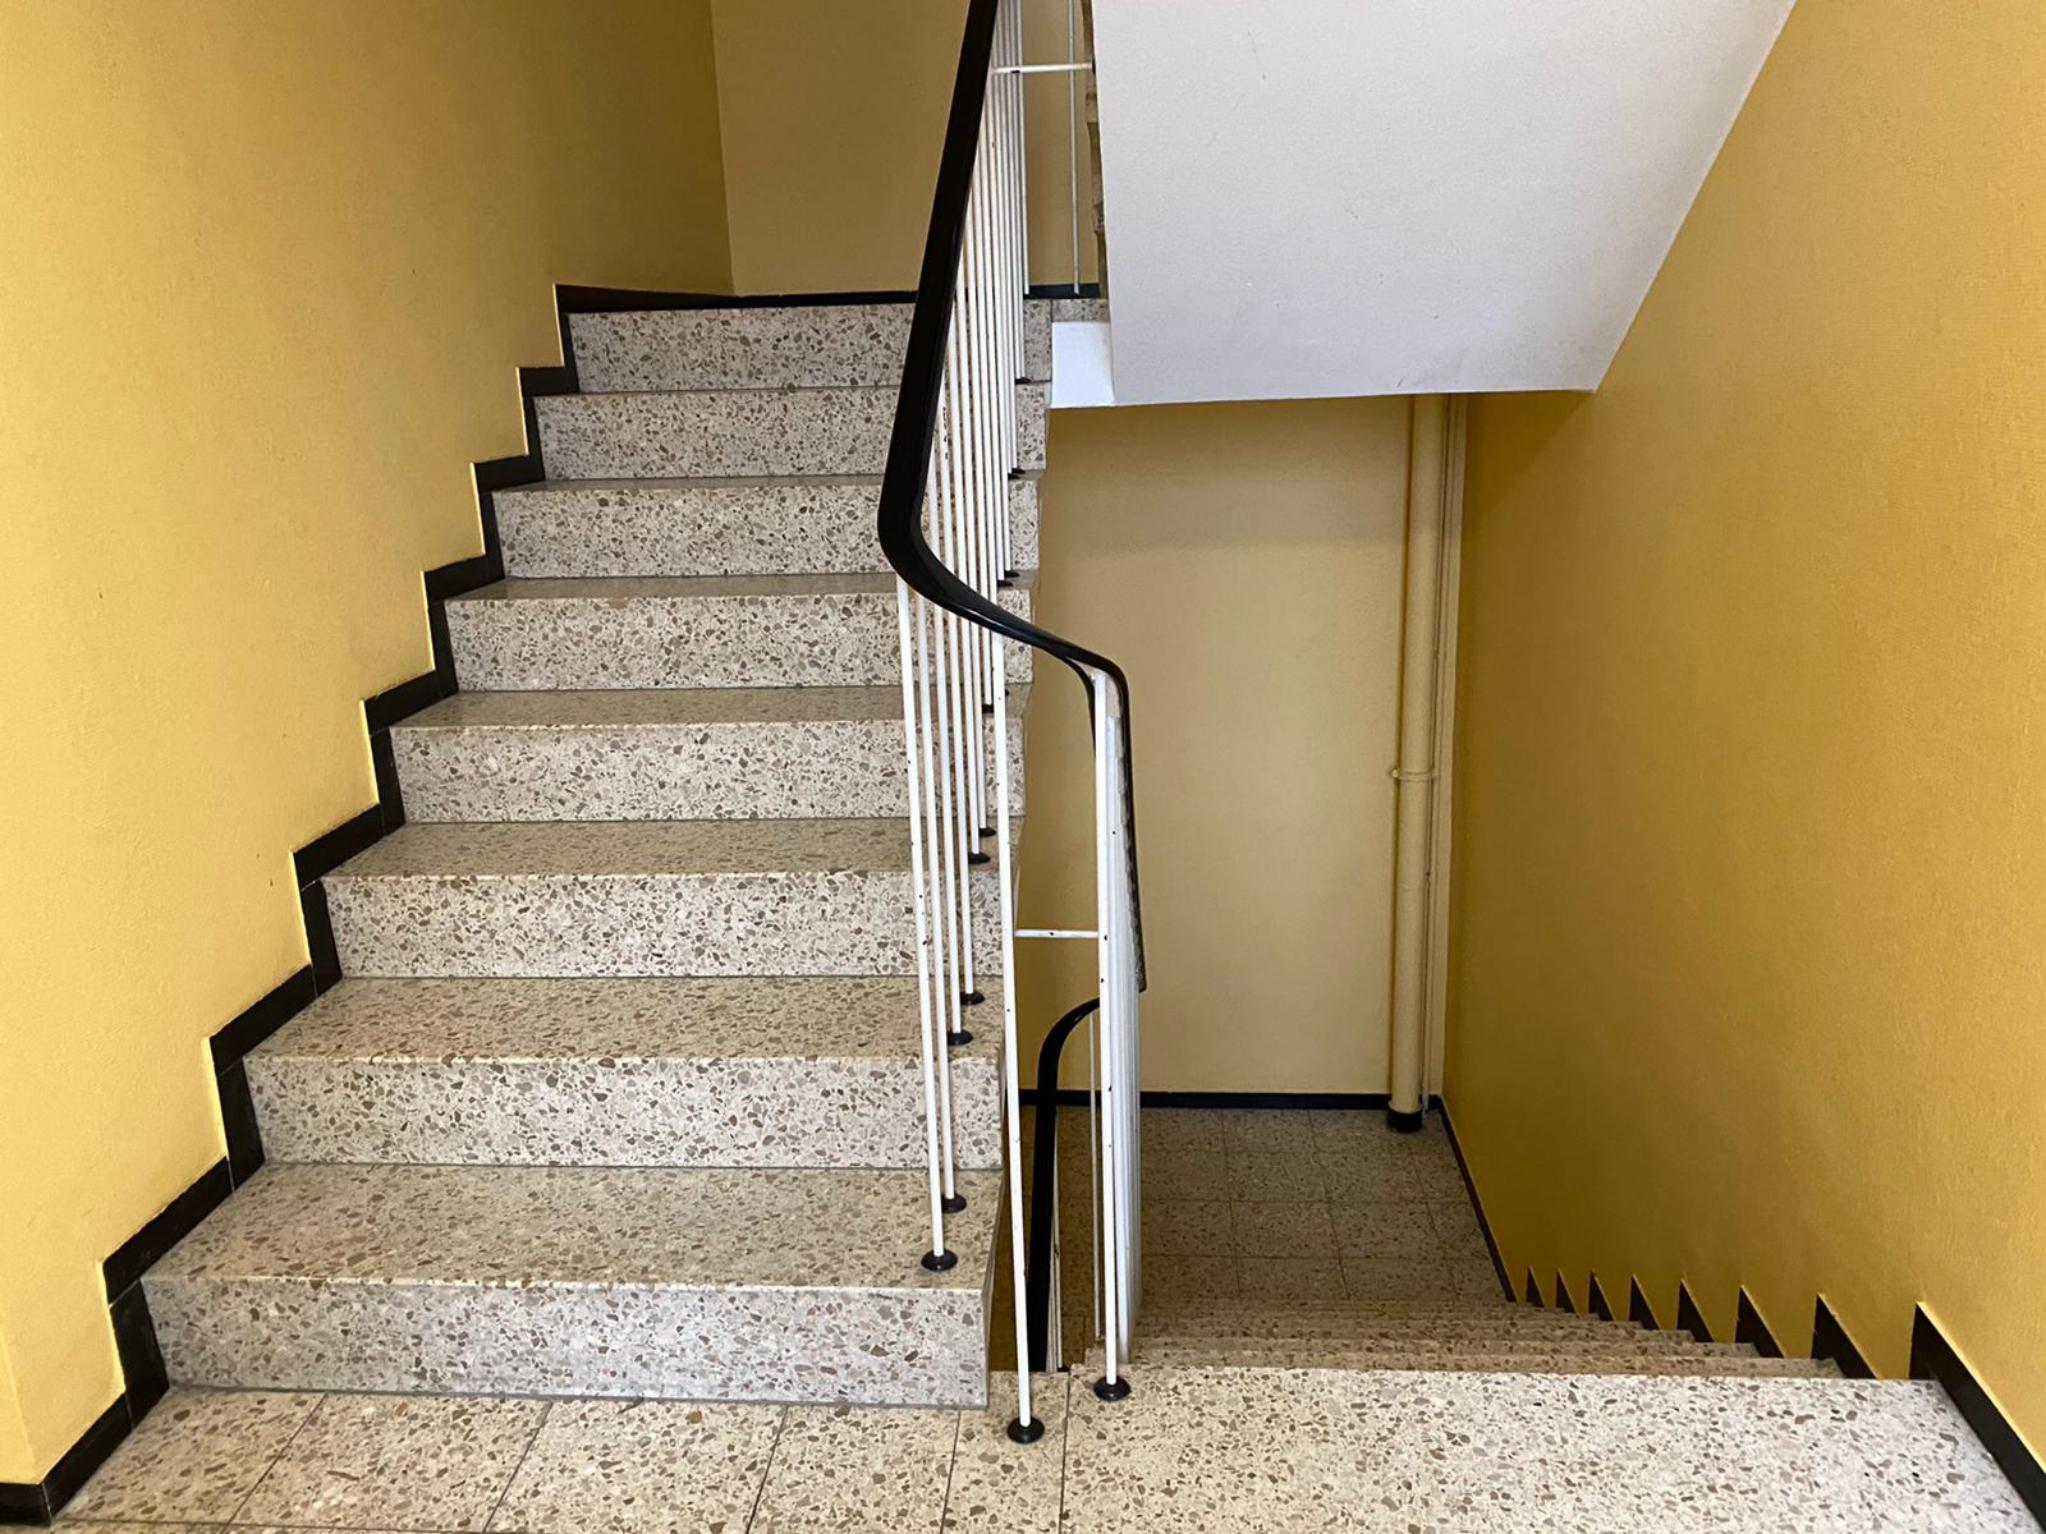 Treppen statt Aufzug. Foto: Diana Hisamudin